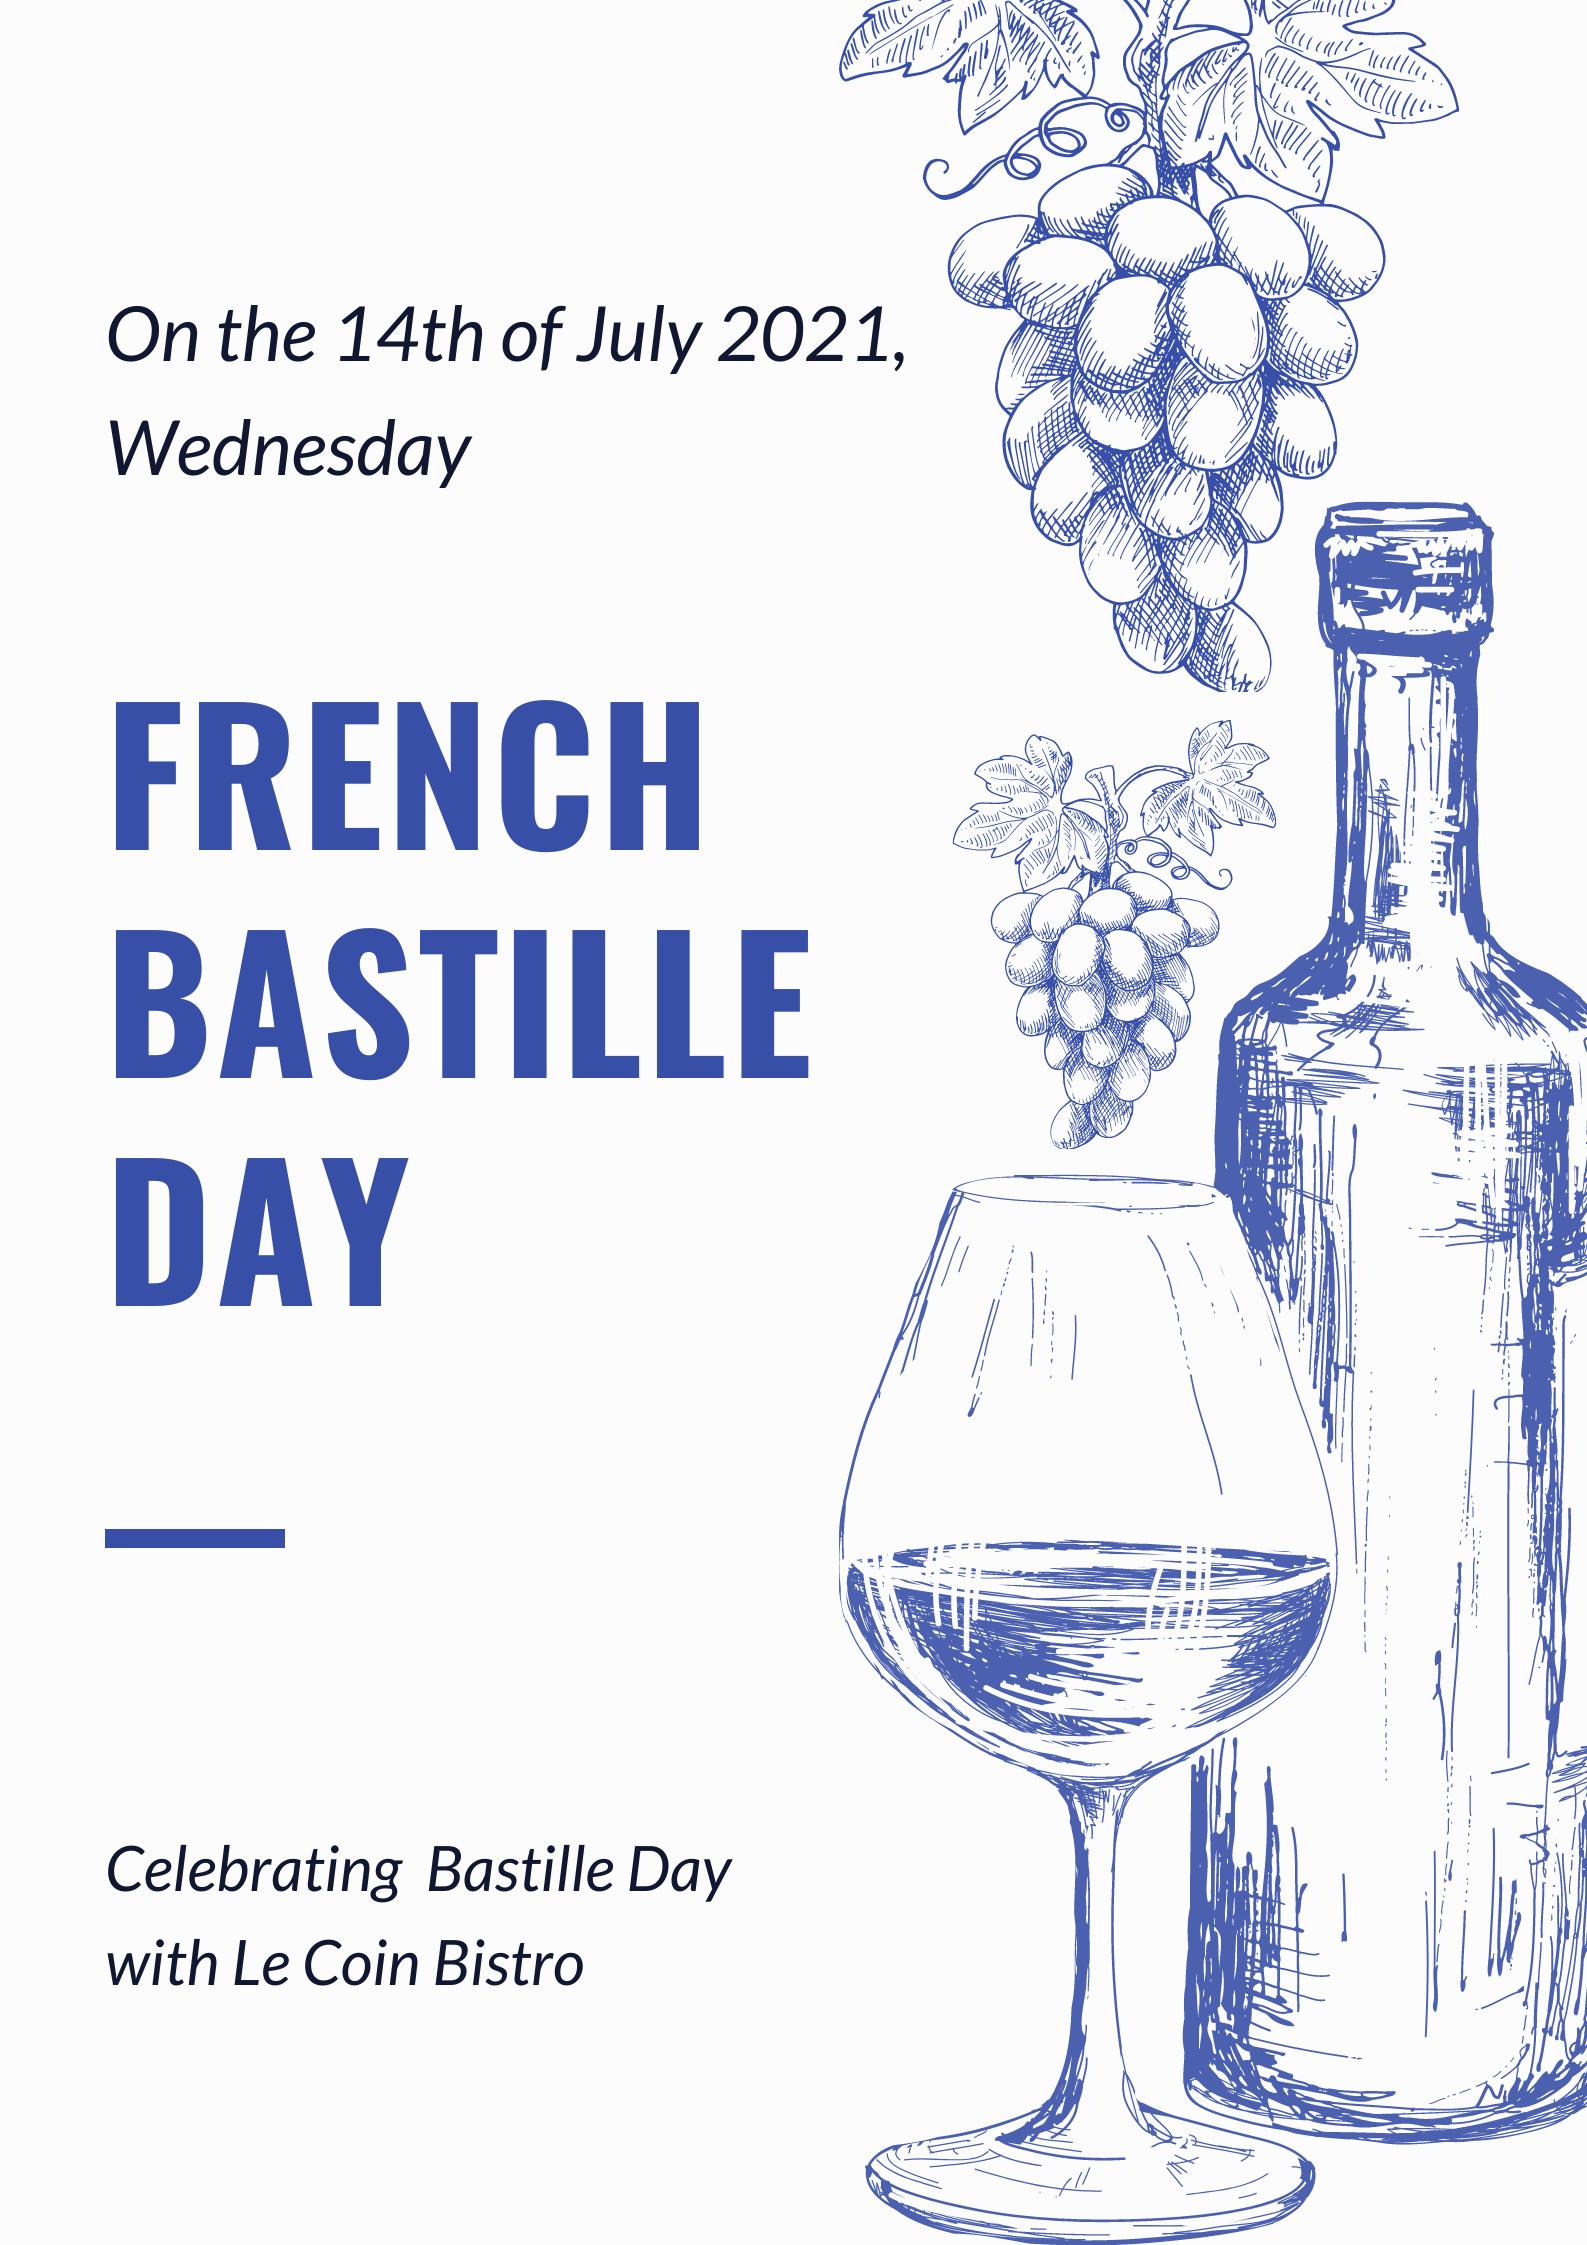 Le Coin Bistro Bastille Day